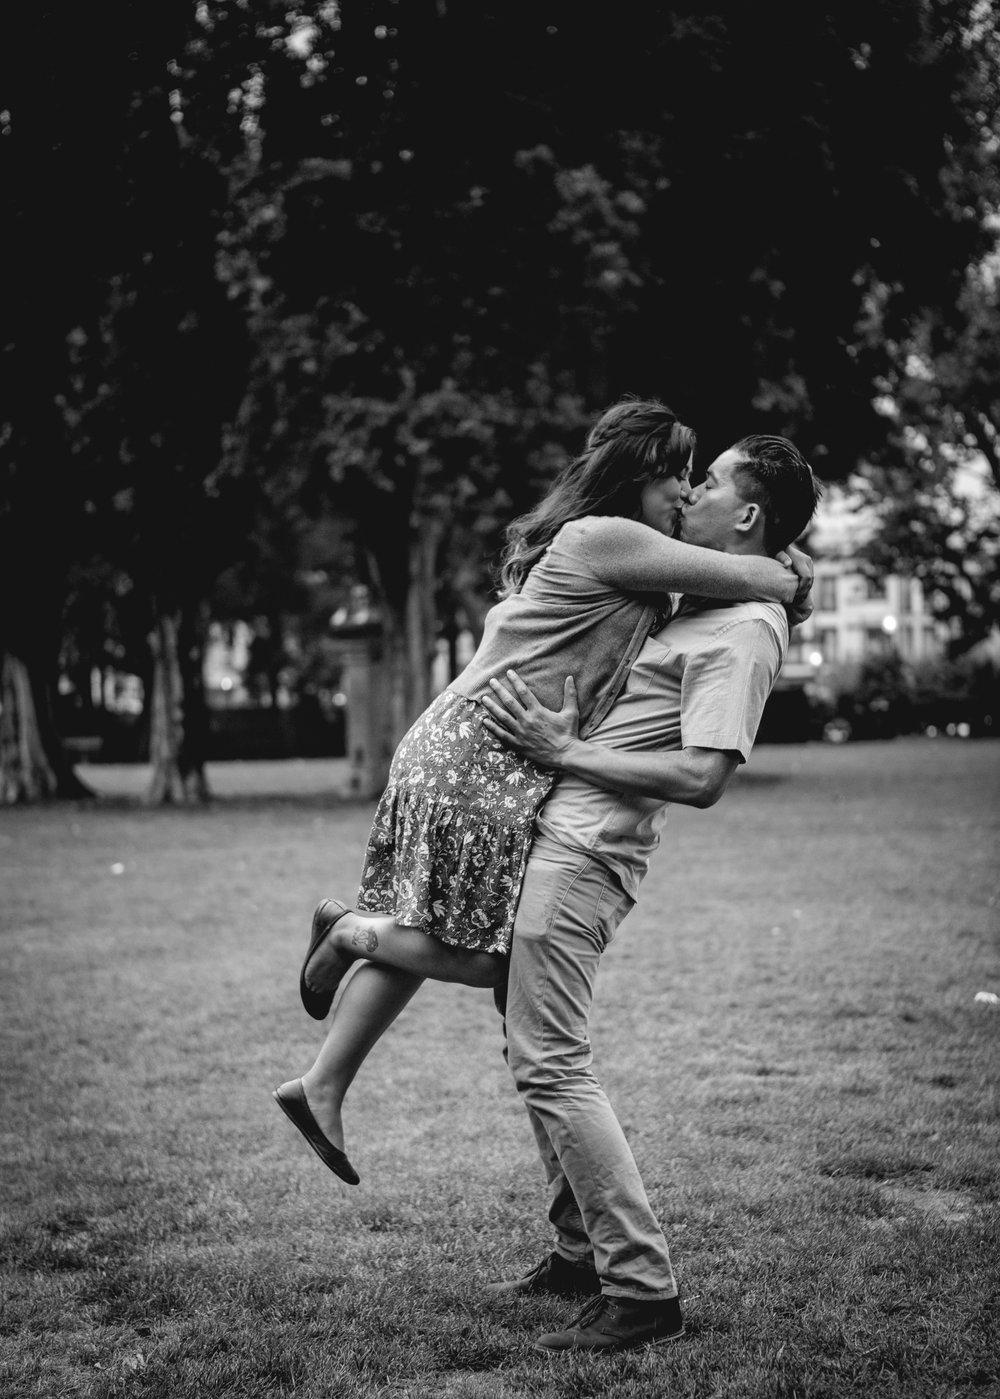 2018.08.12_Derrick-Vanessa Engagement_30-2.jpg